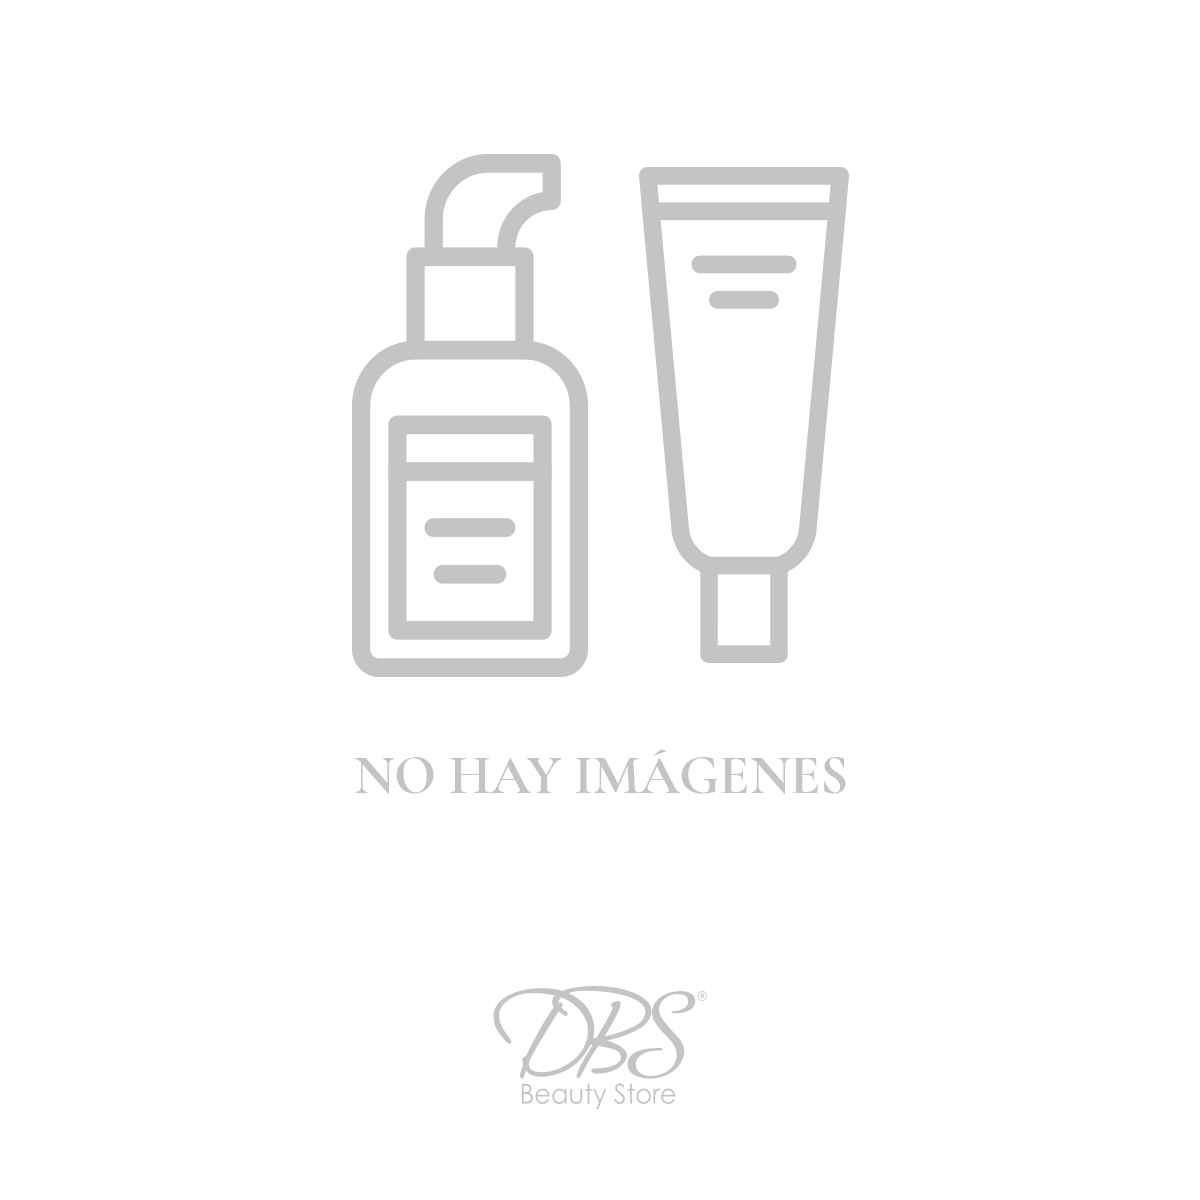 loreal-maquillaje-LO-43160.jpg